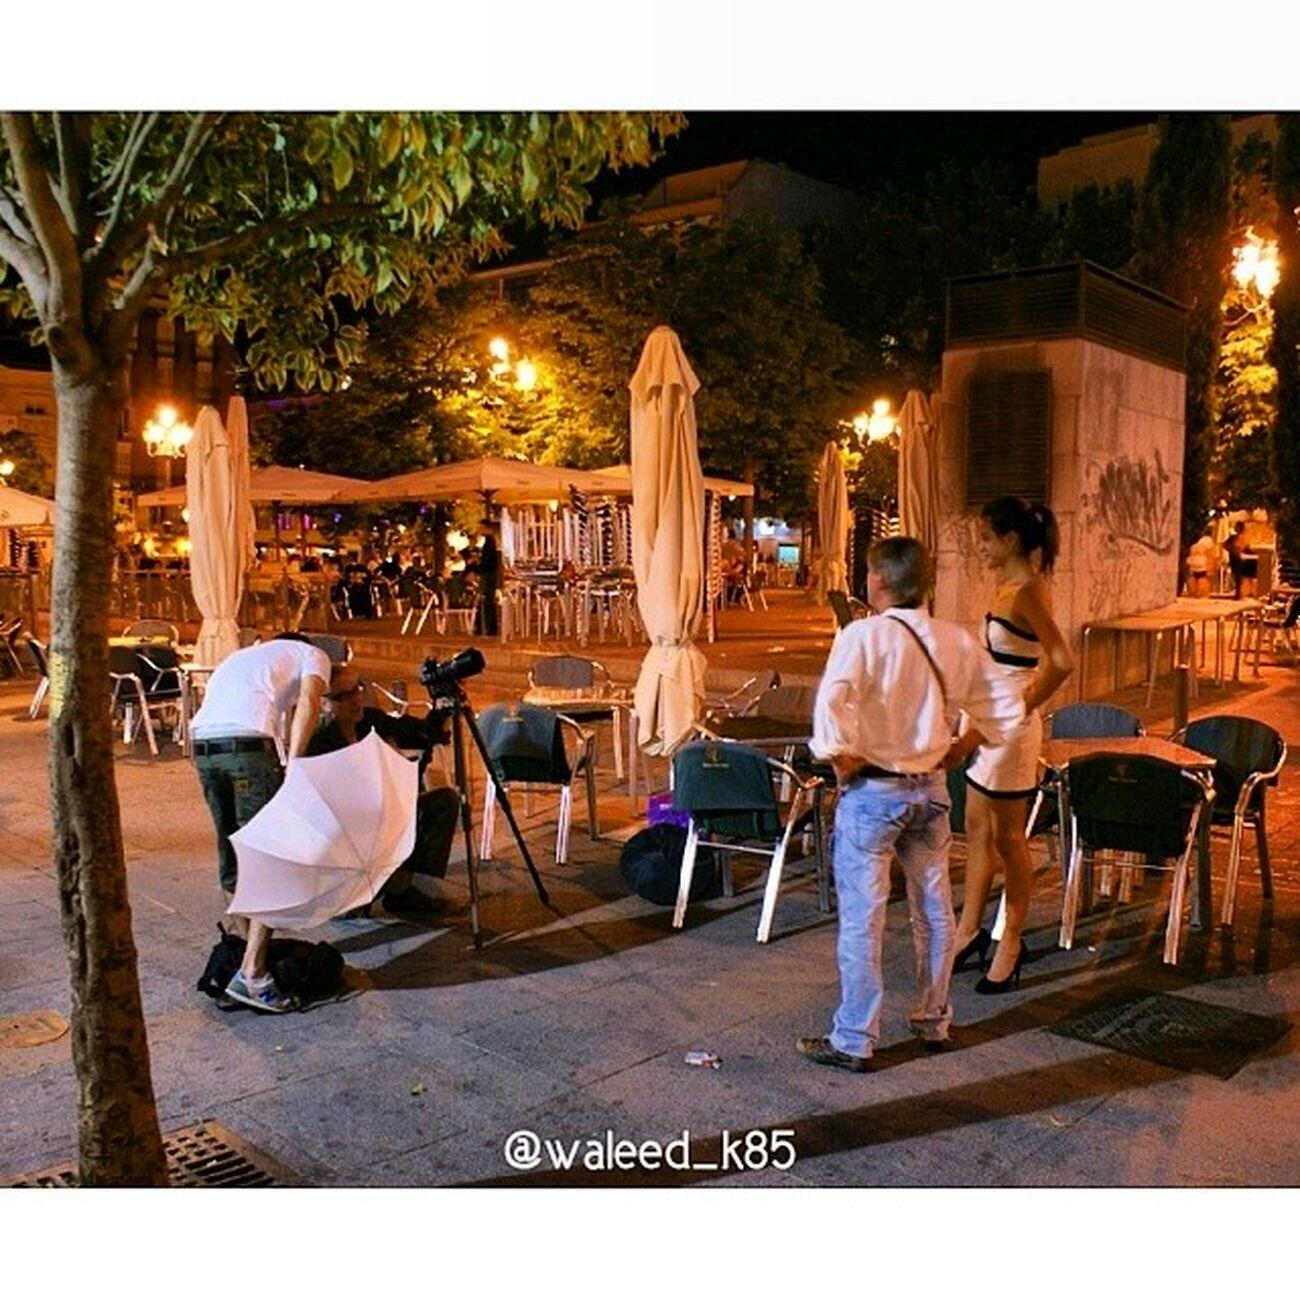 Model Photoset  infront the HotelMe MeMadrid hotel at the PlazaSantaAna Madrid Spain españa. Taken by my sonyalpha dslr a200. Taken in my 2010 summer trip مدريد اسبانيا فندق تصوير عارضة